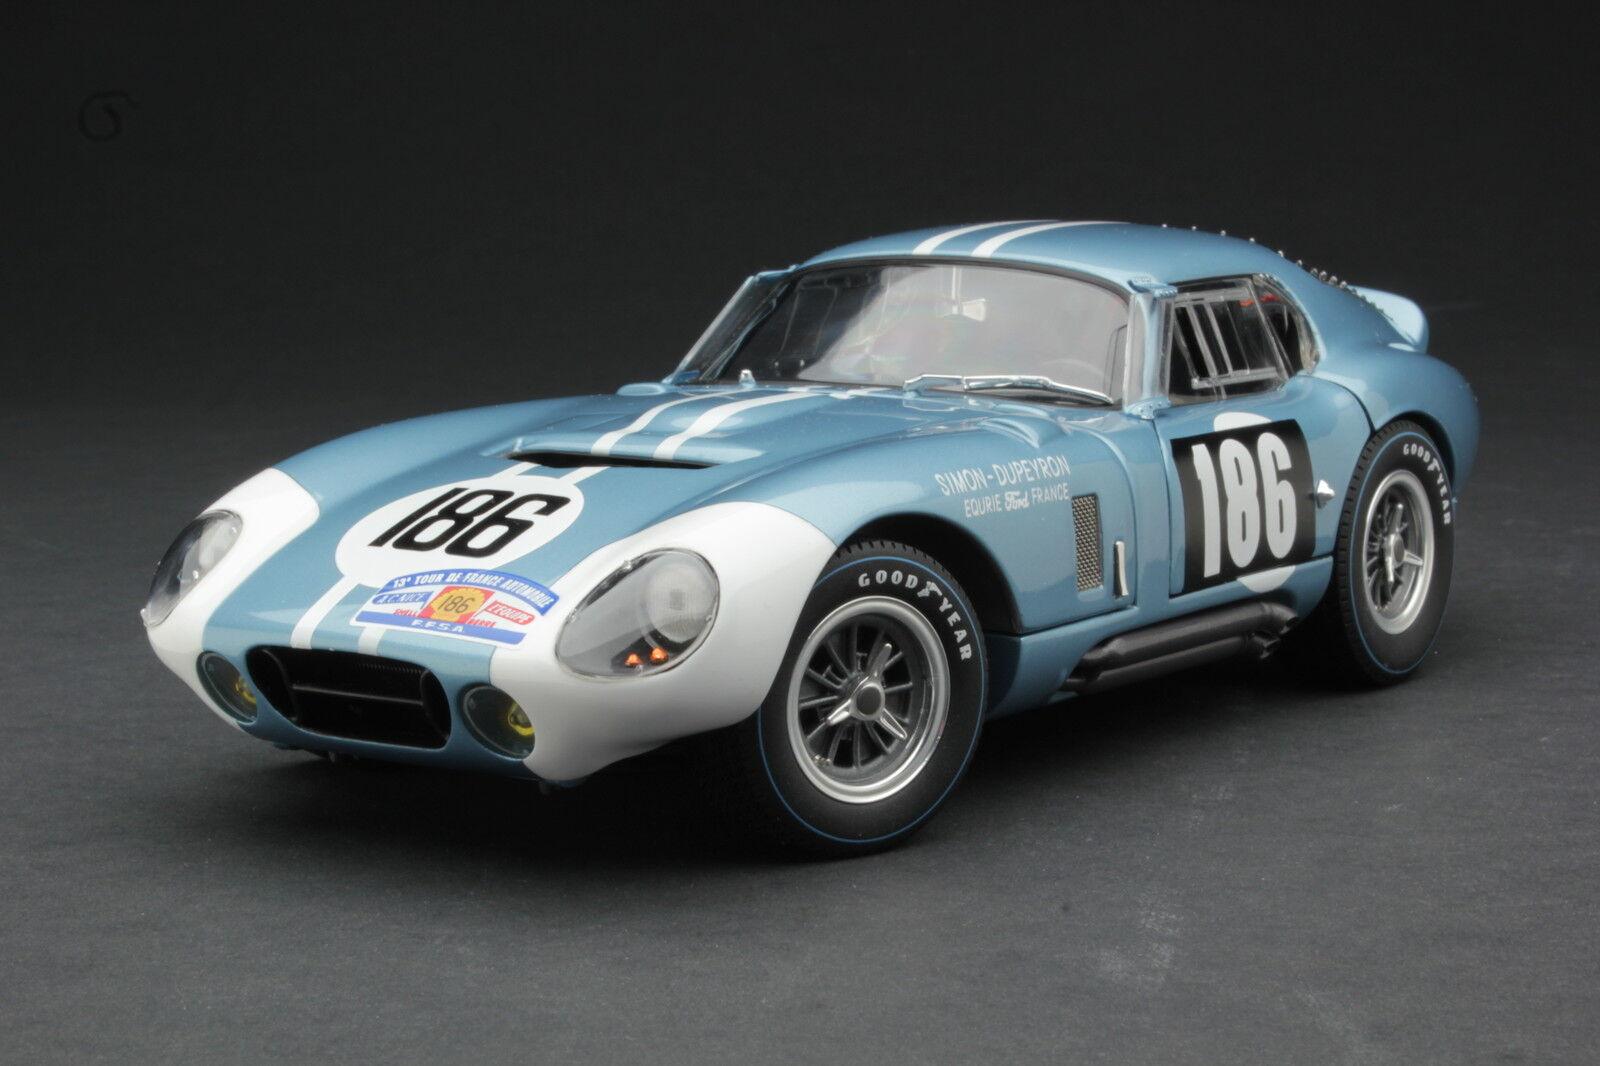 tienda de descuento Exoto Exoto Exoto 1964 Cobra Daytona Coupé Tdf   Tour de France   Escala 1 18    RLG18016B  encuentra tu favorito aquí